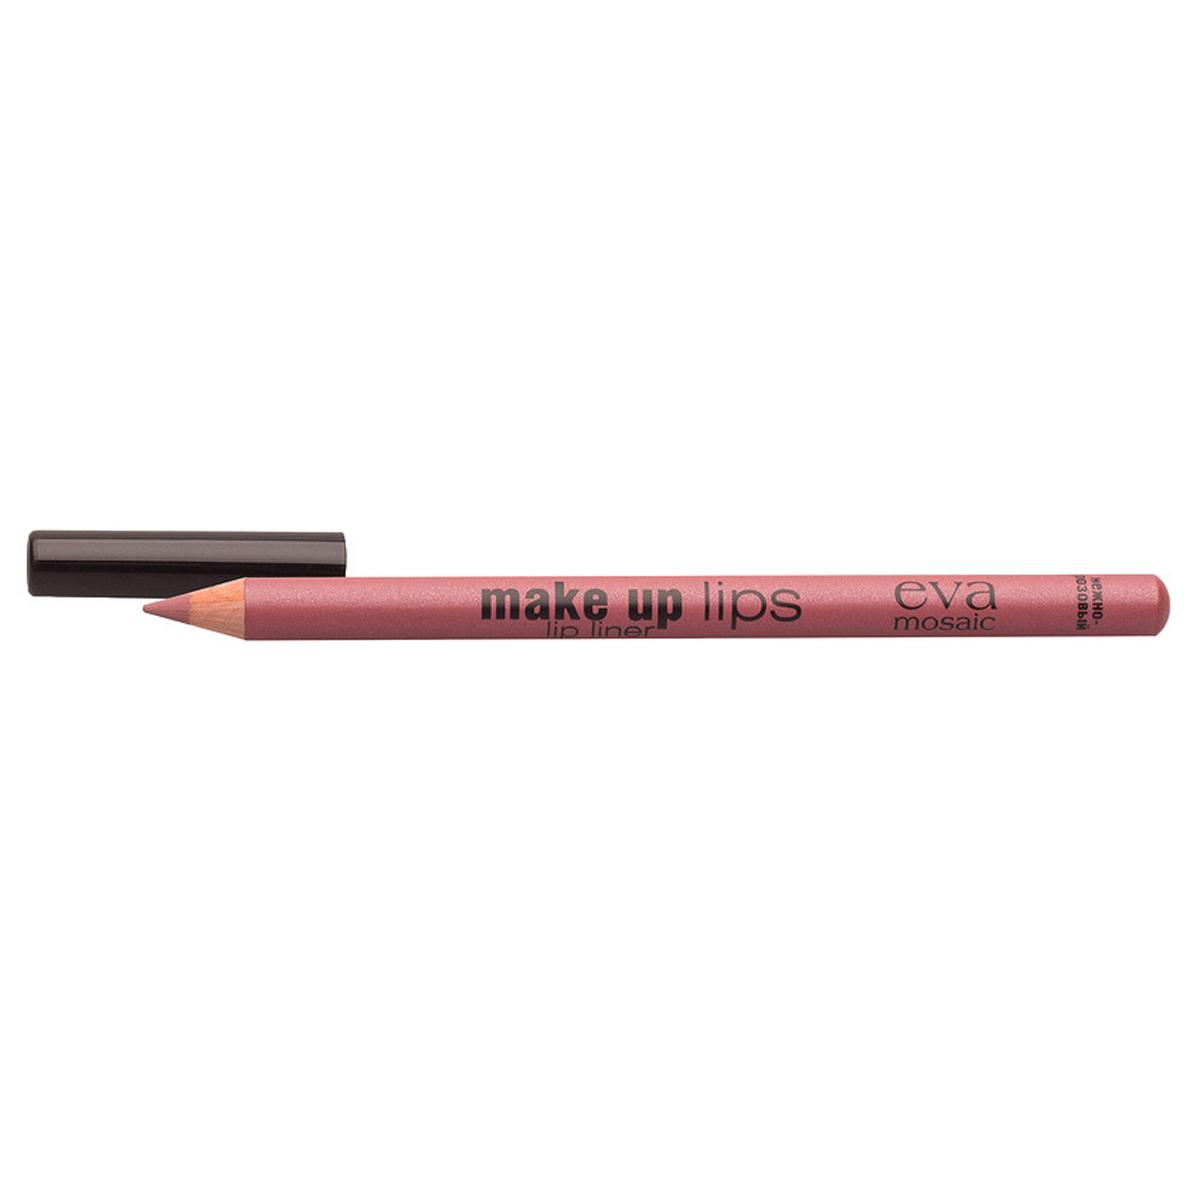 Eva Mosaic Карандаш для объема губ Make Up Lips, 1,1 г, Нежно-Розовый tom & eva to037awtji88